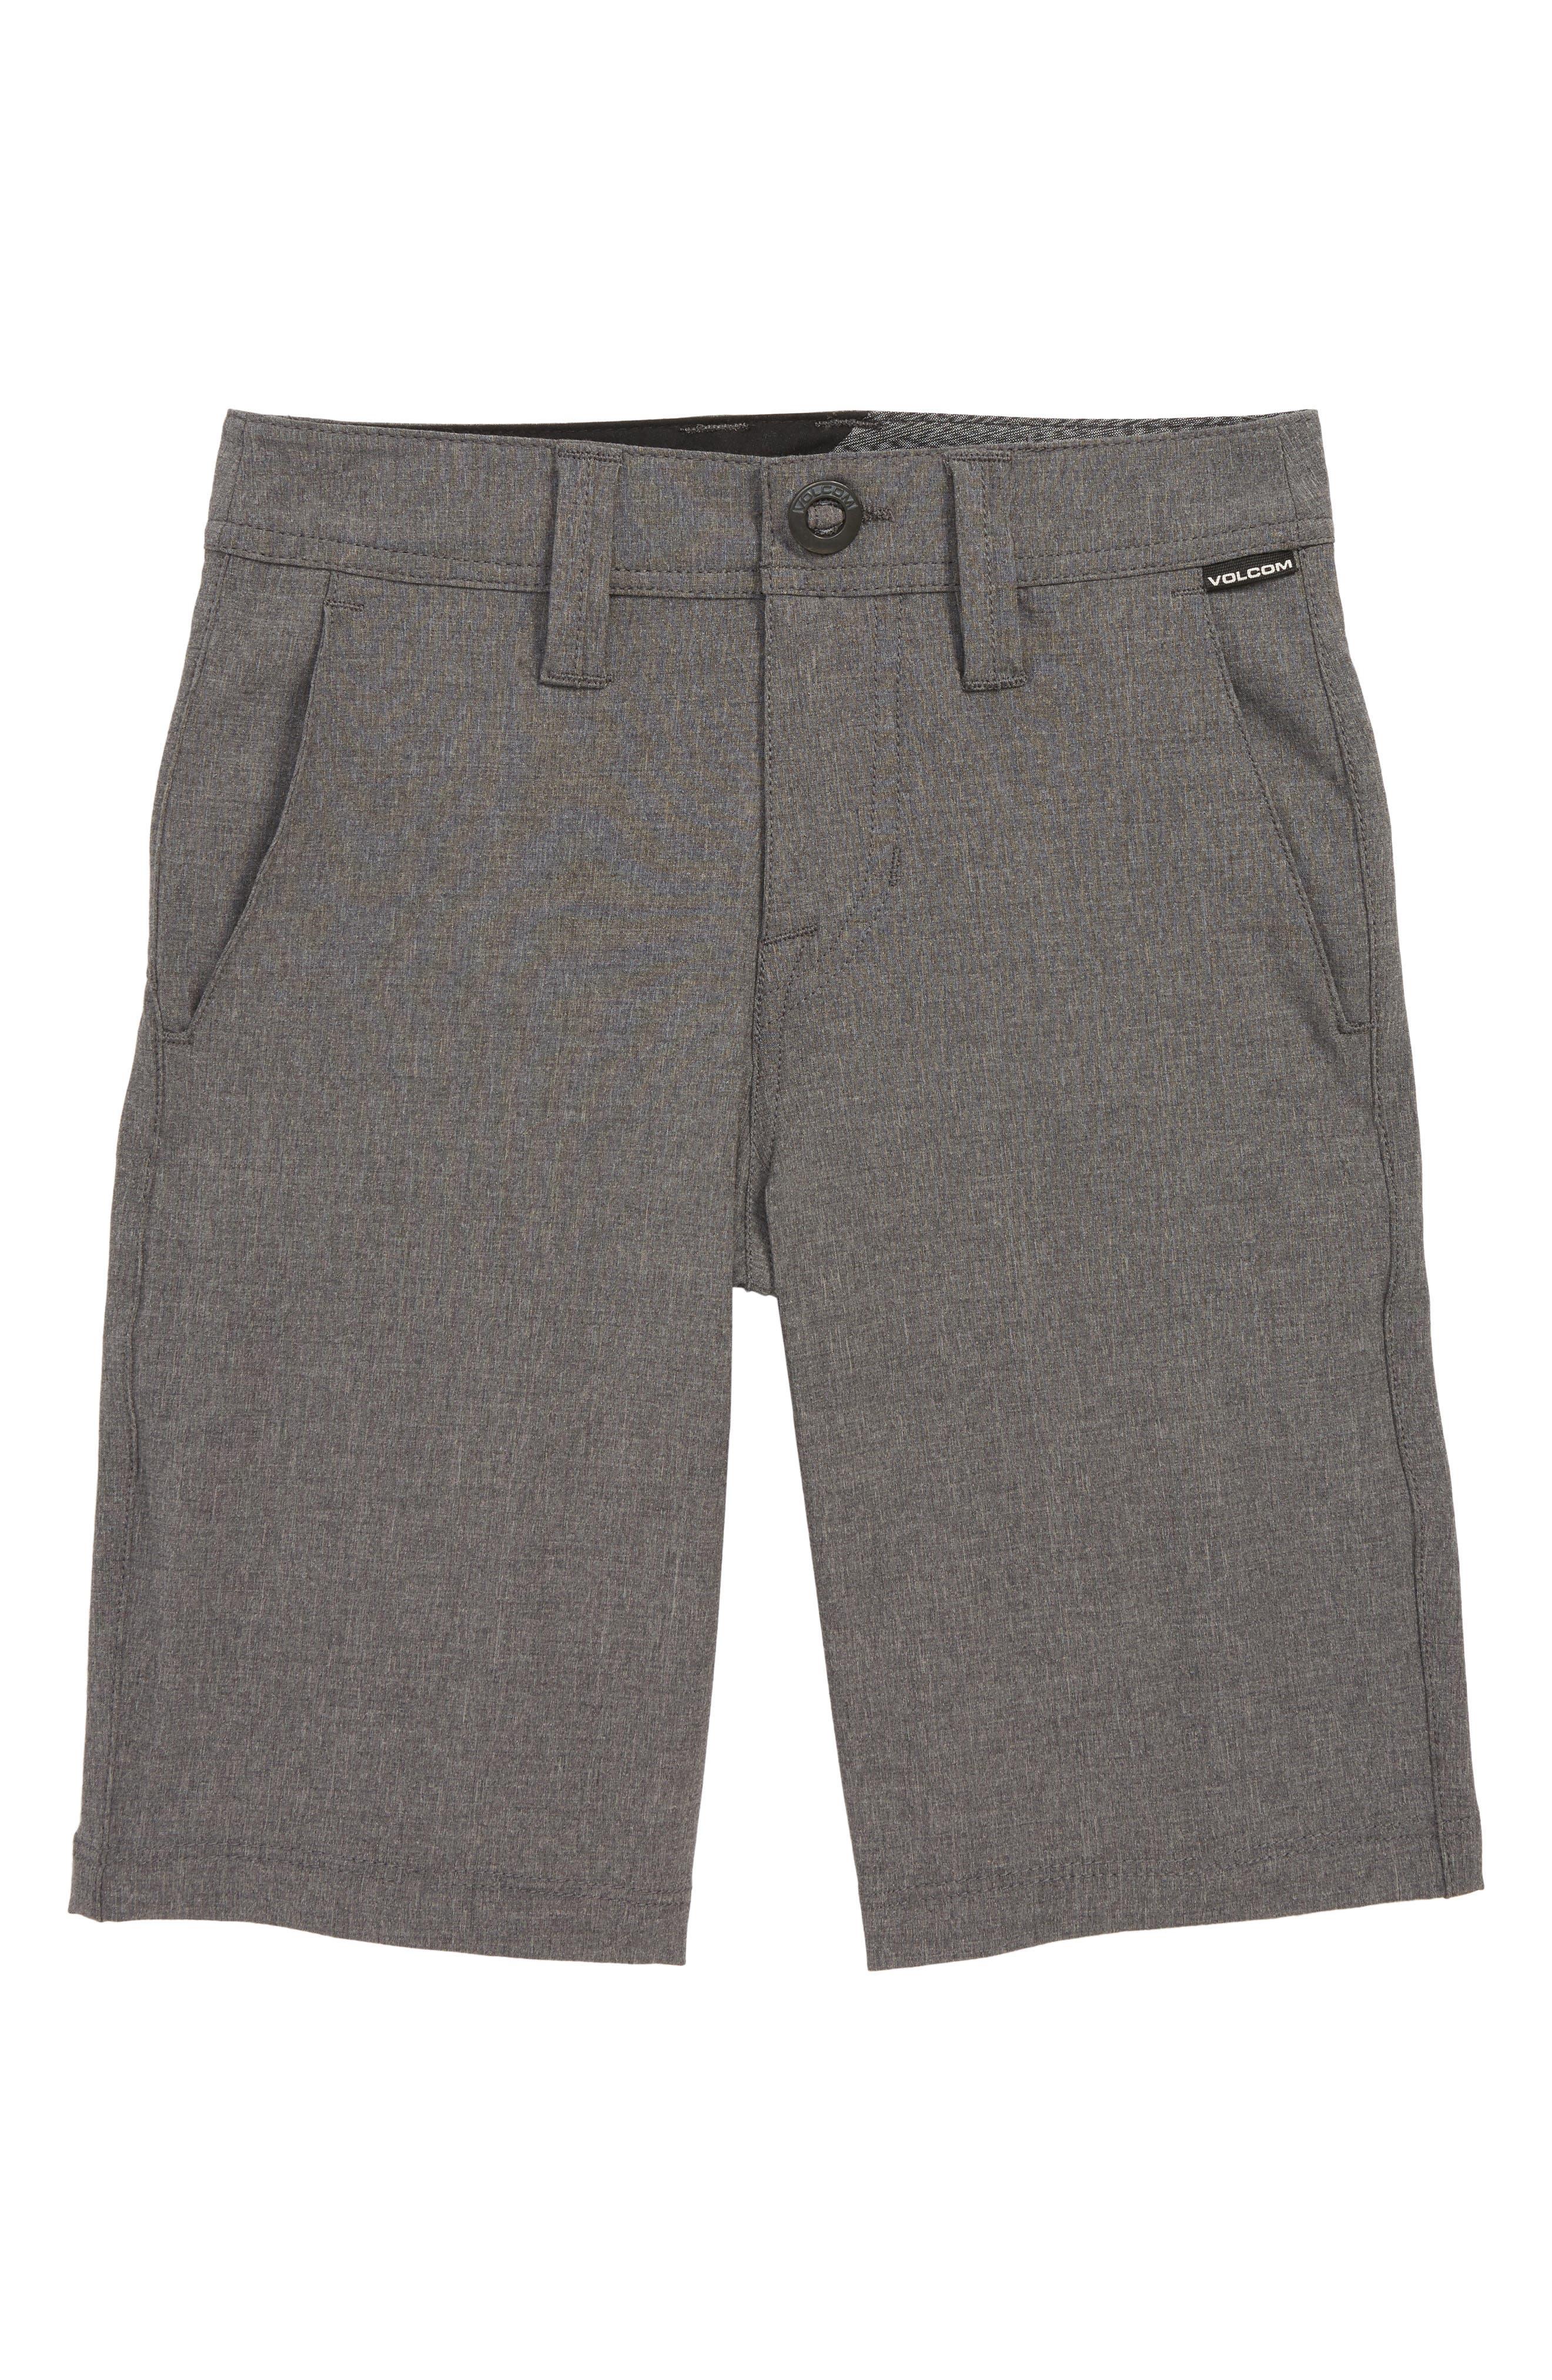 Boys Volcom Frickin Surf N Turf Static Hybrid Board Shorts Size 25  Grey